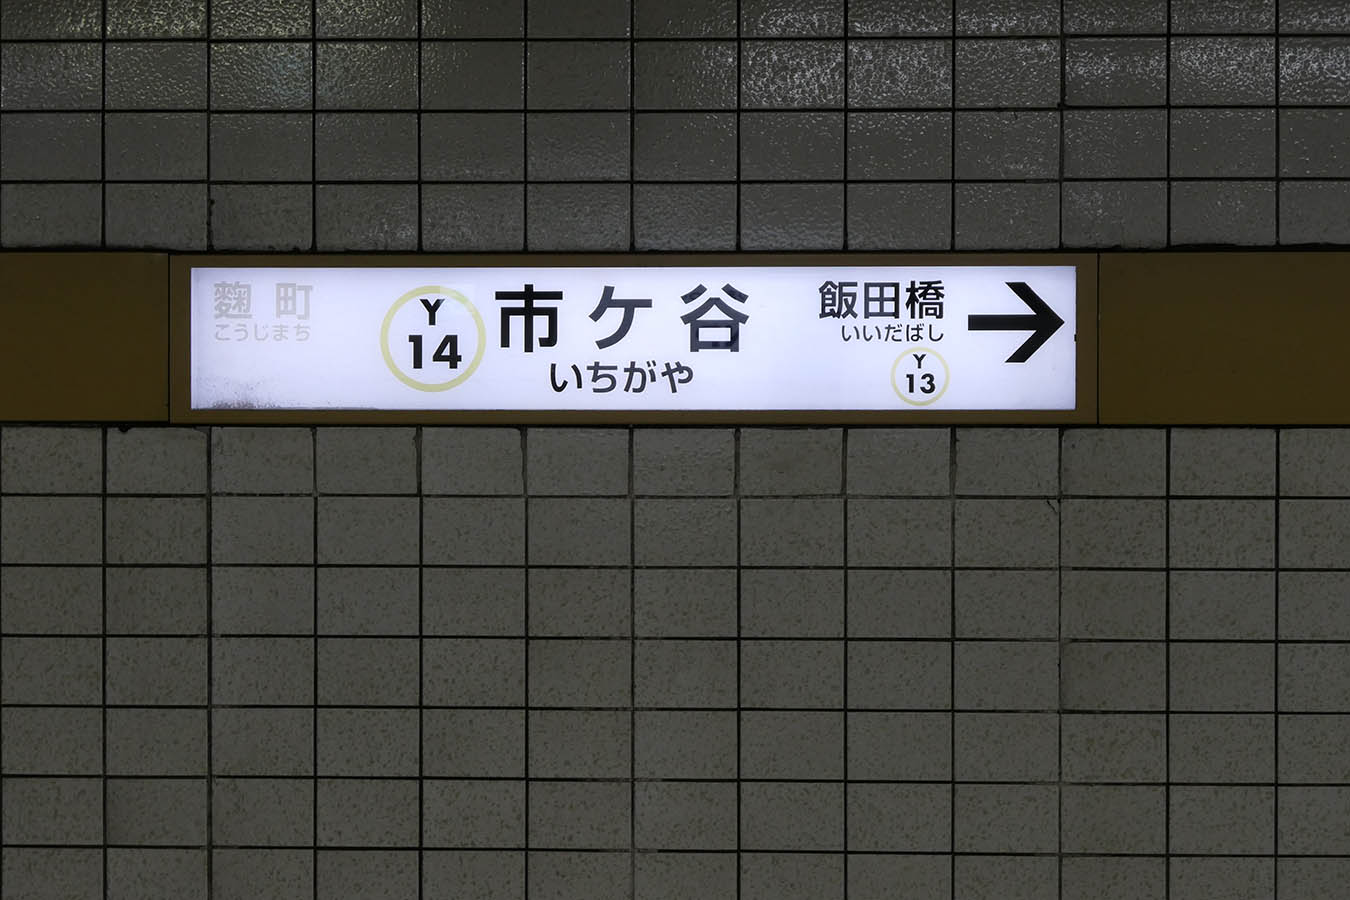 Y14_photo03.jpg